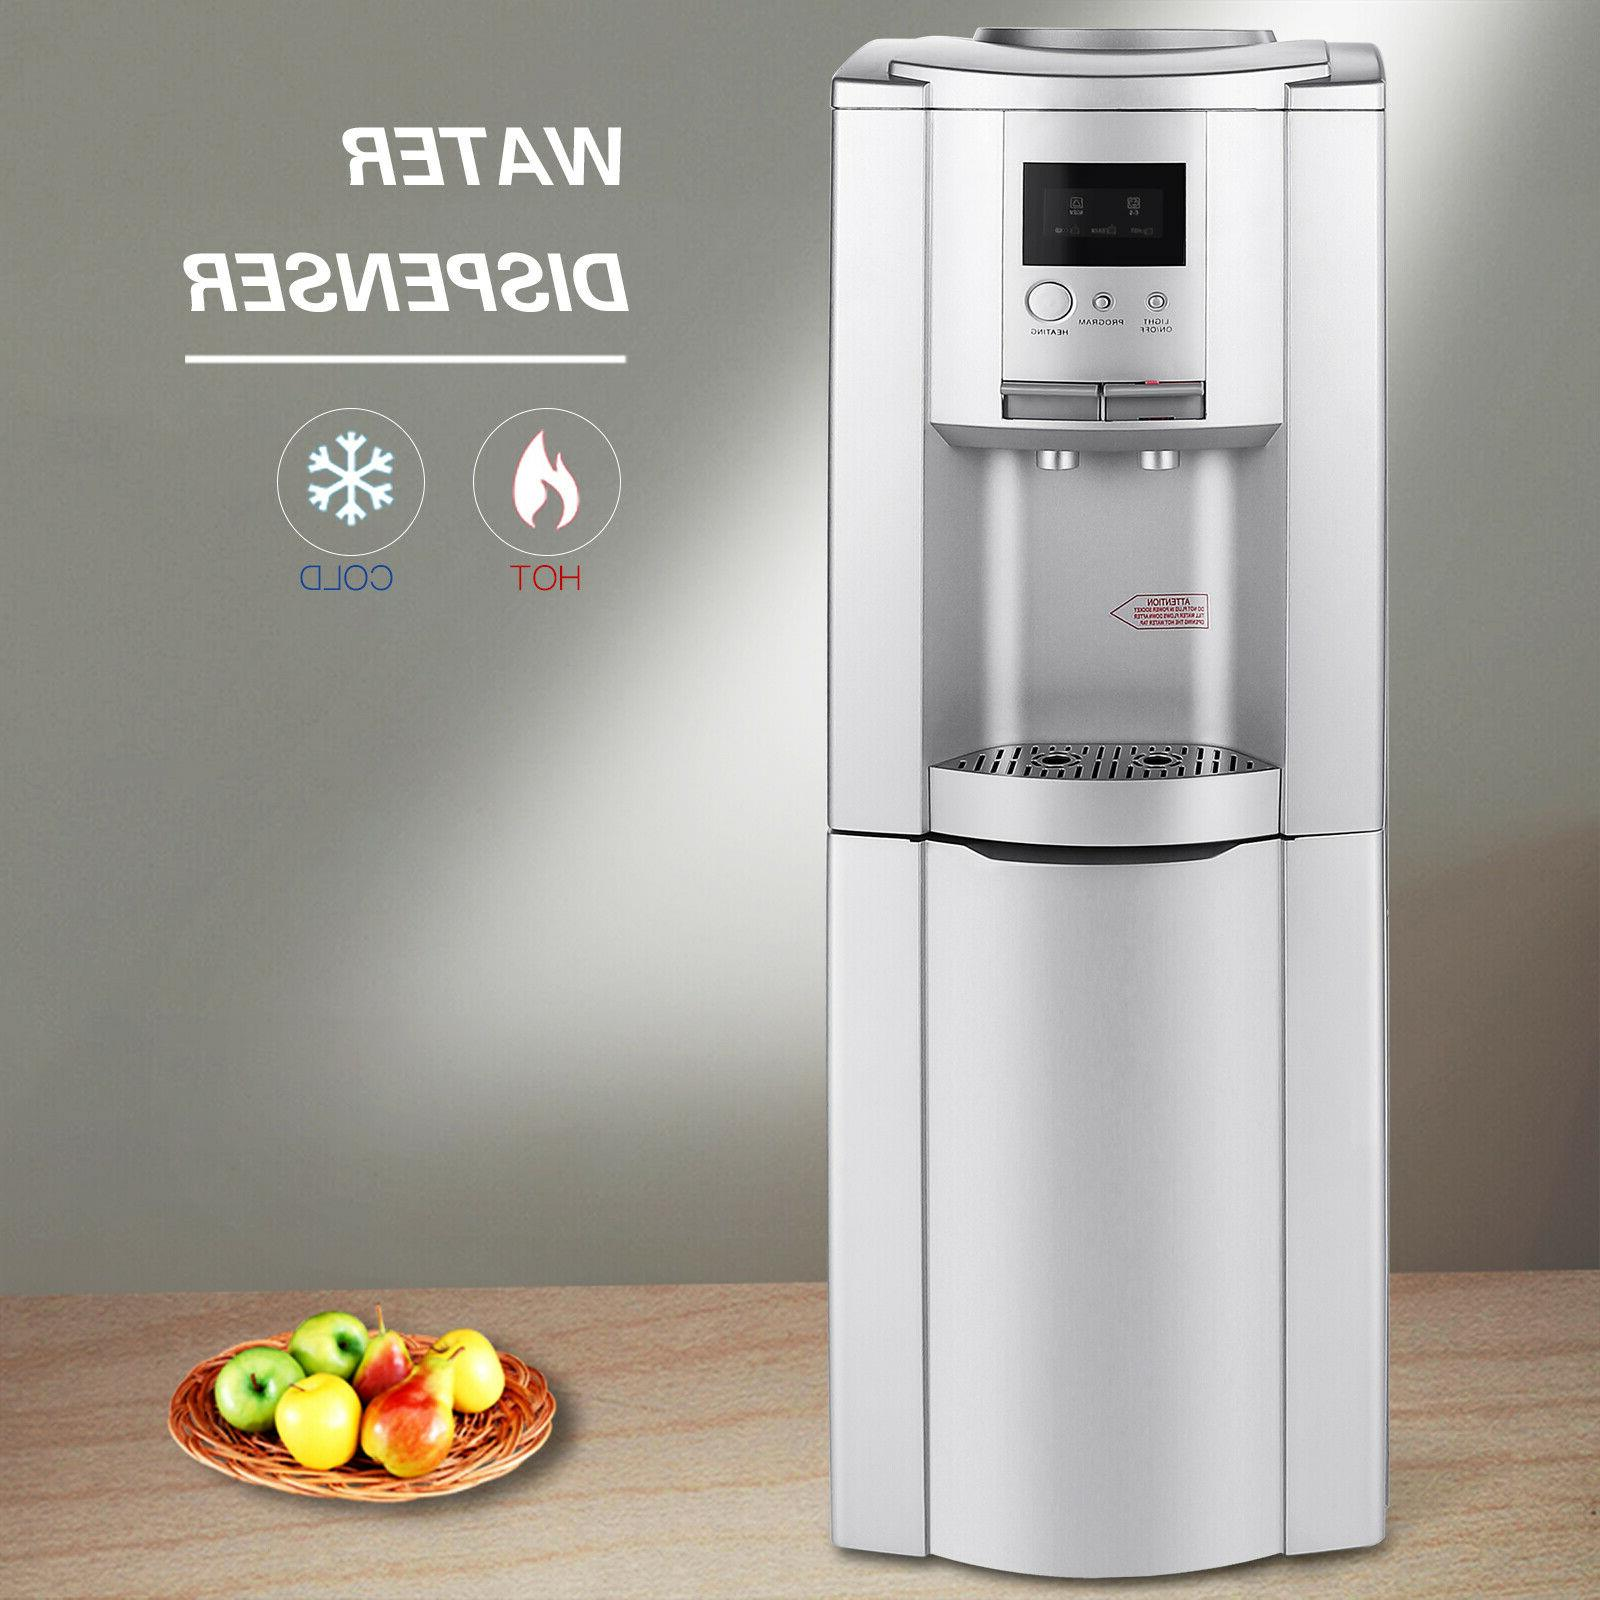 5 Dispenser Loading Cabine Hot Cold Water